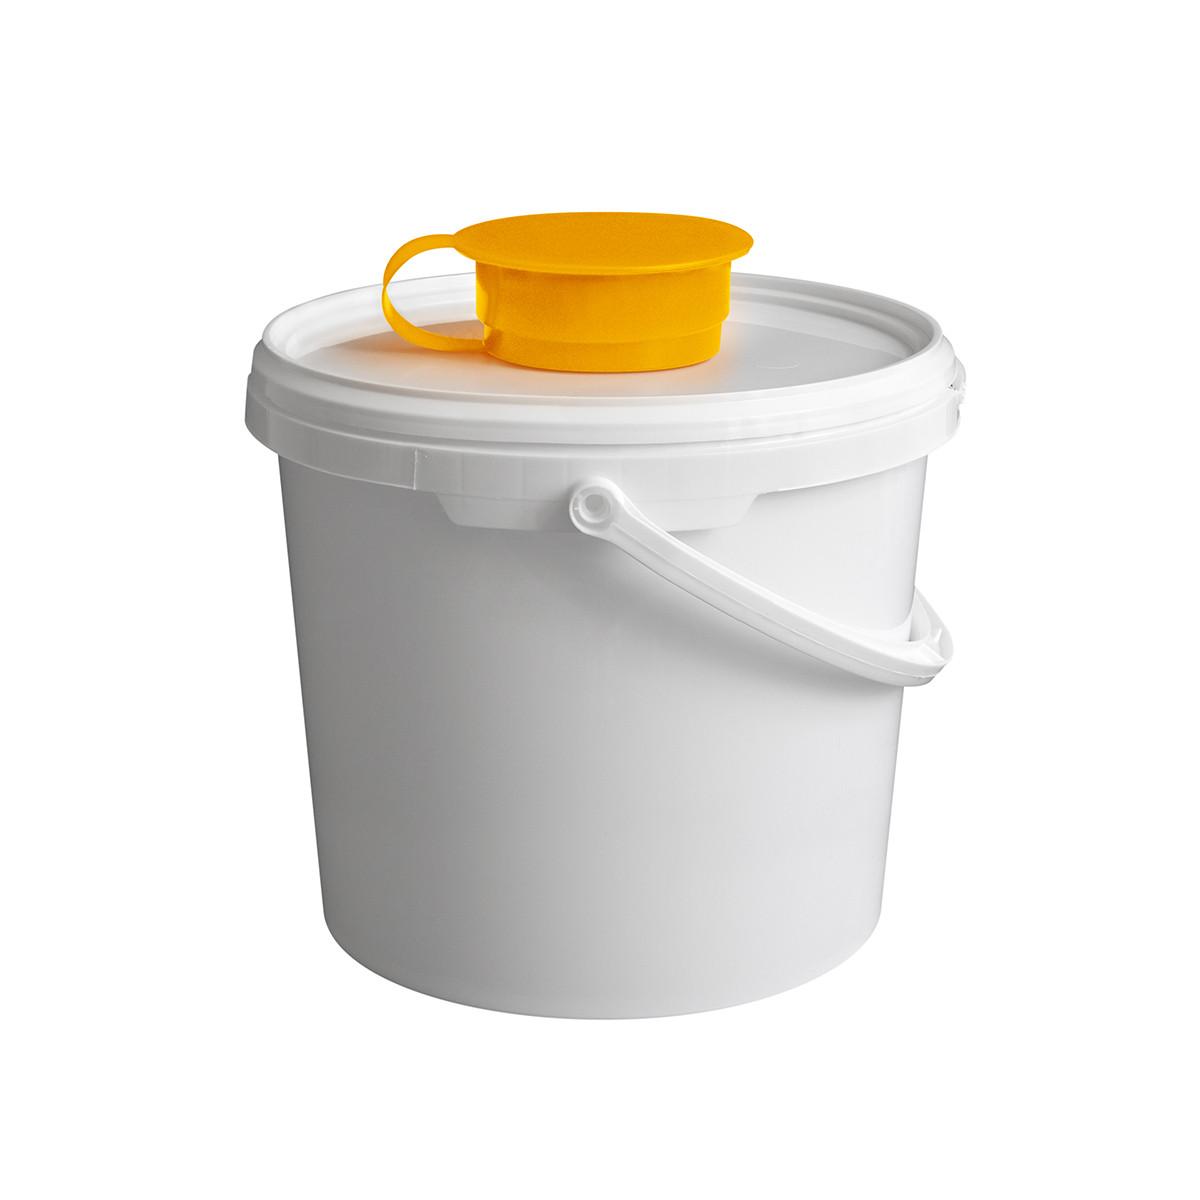 Ведро-диспенсер для дезинфицирующих салфеток TEMDEX 5.7 Для бумажных полотенец, салфеток, Желтый